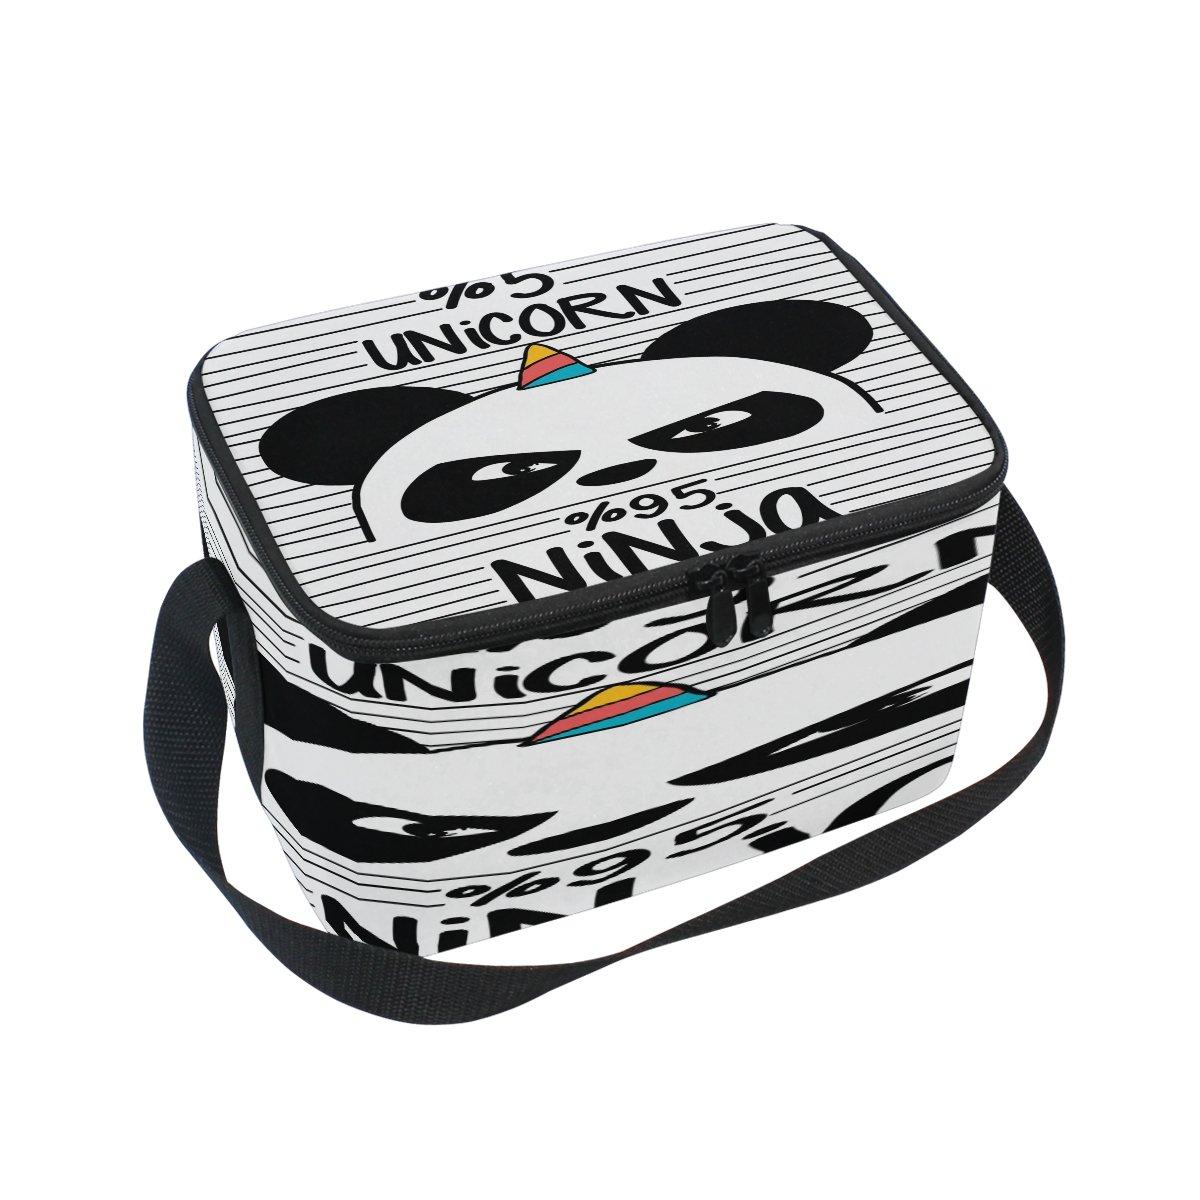 d75fd2ea8 Amazon.com: Use4 Cartoon Panda Unicorn Striped Black White Insulated Lunch Bag  Tote Bag Cooler Lunchbox for Picnic School Women Men Kids: Kitchen & Dining